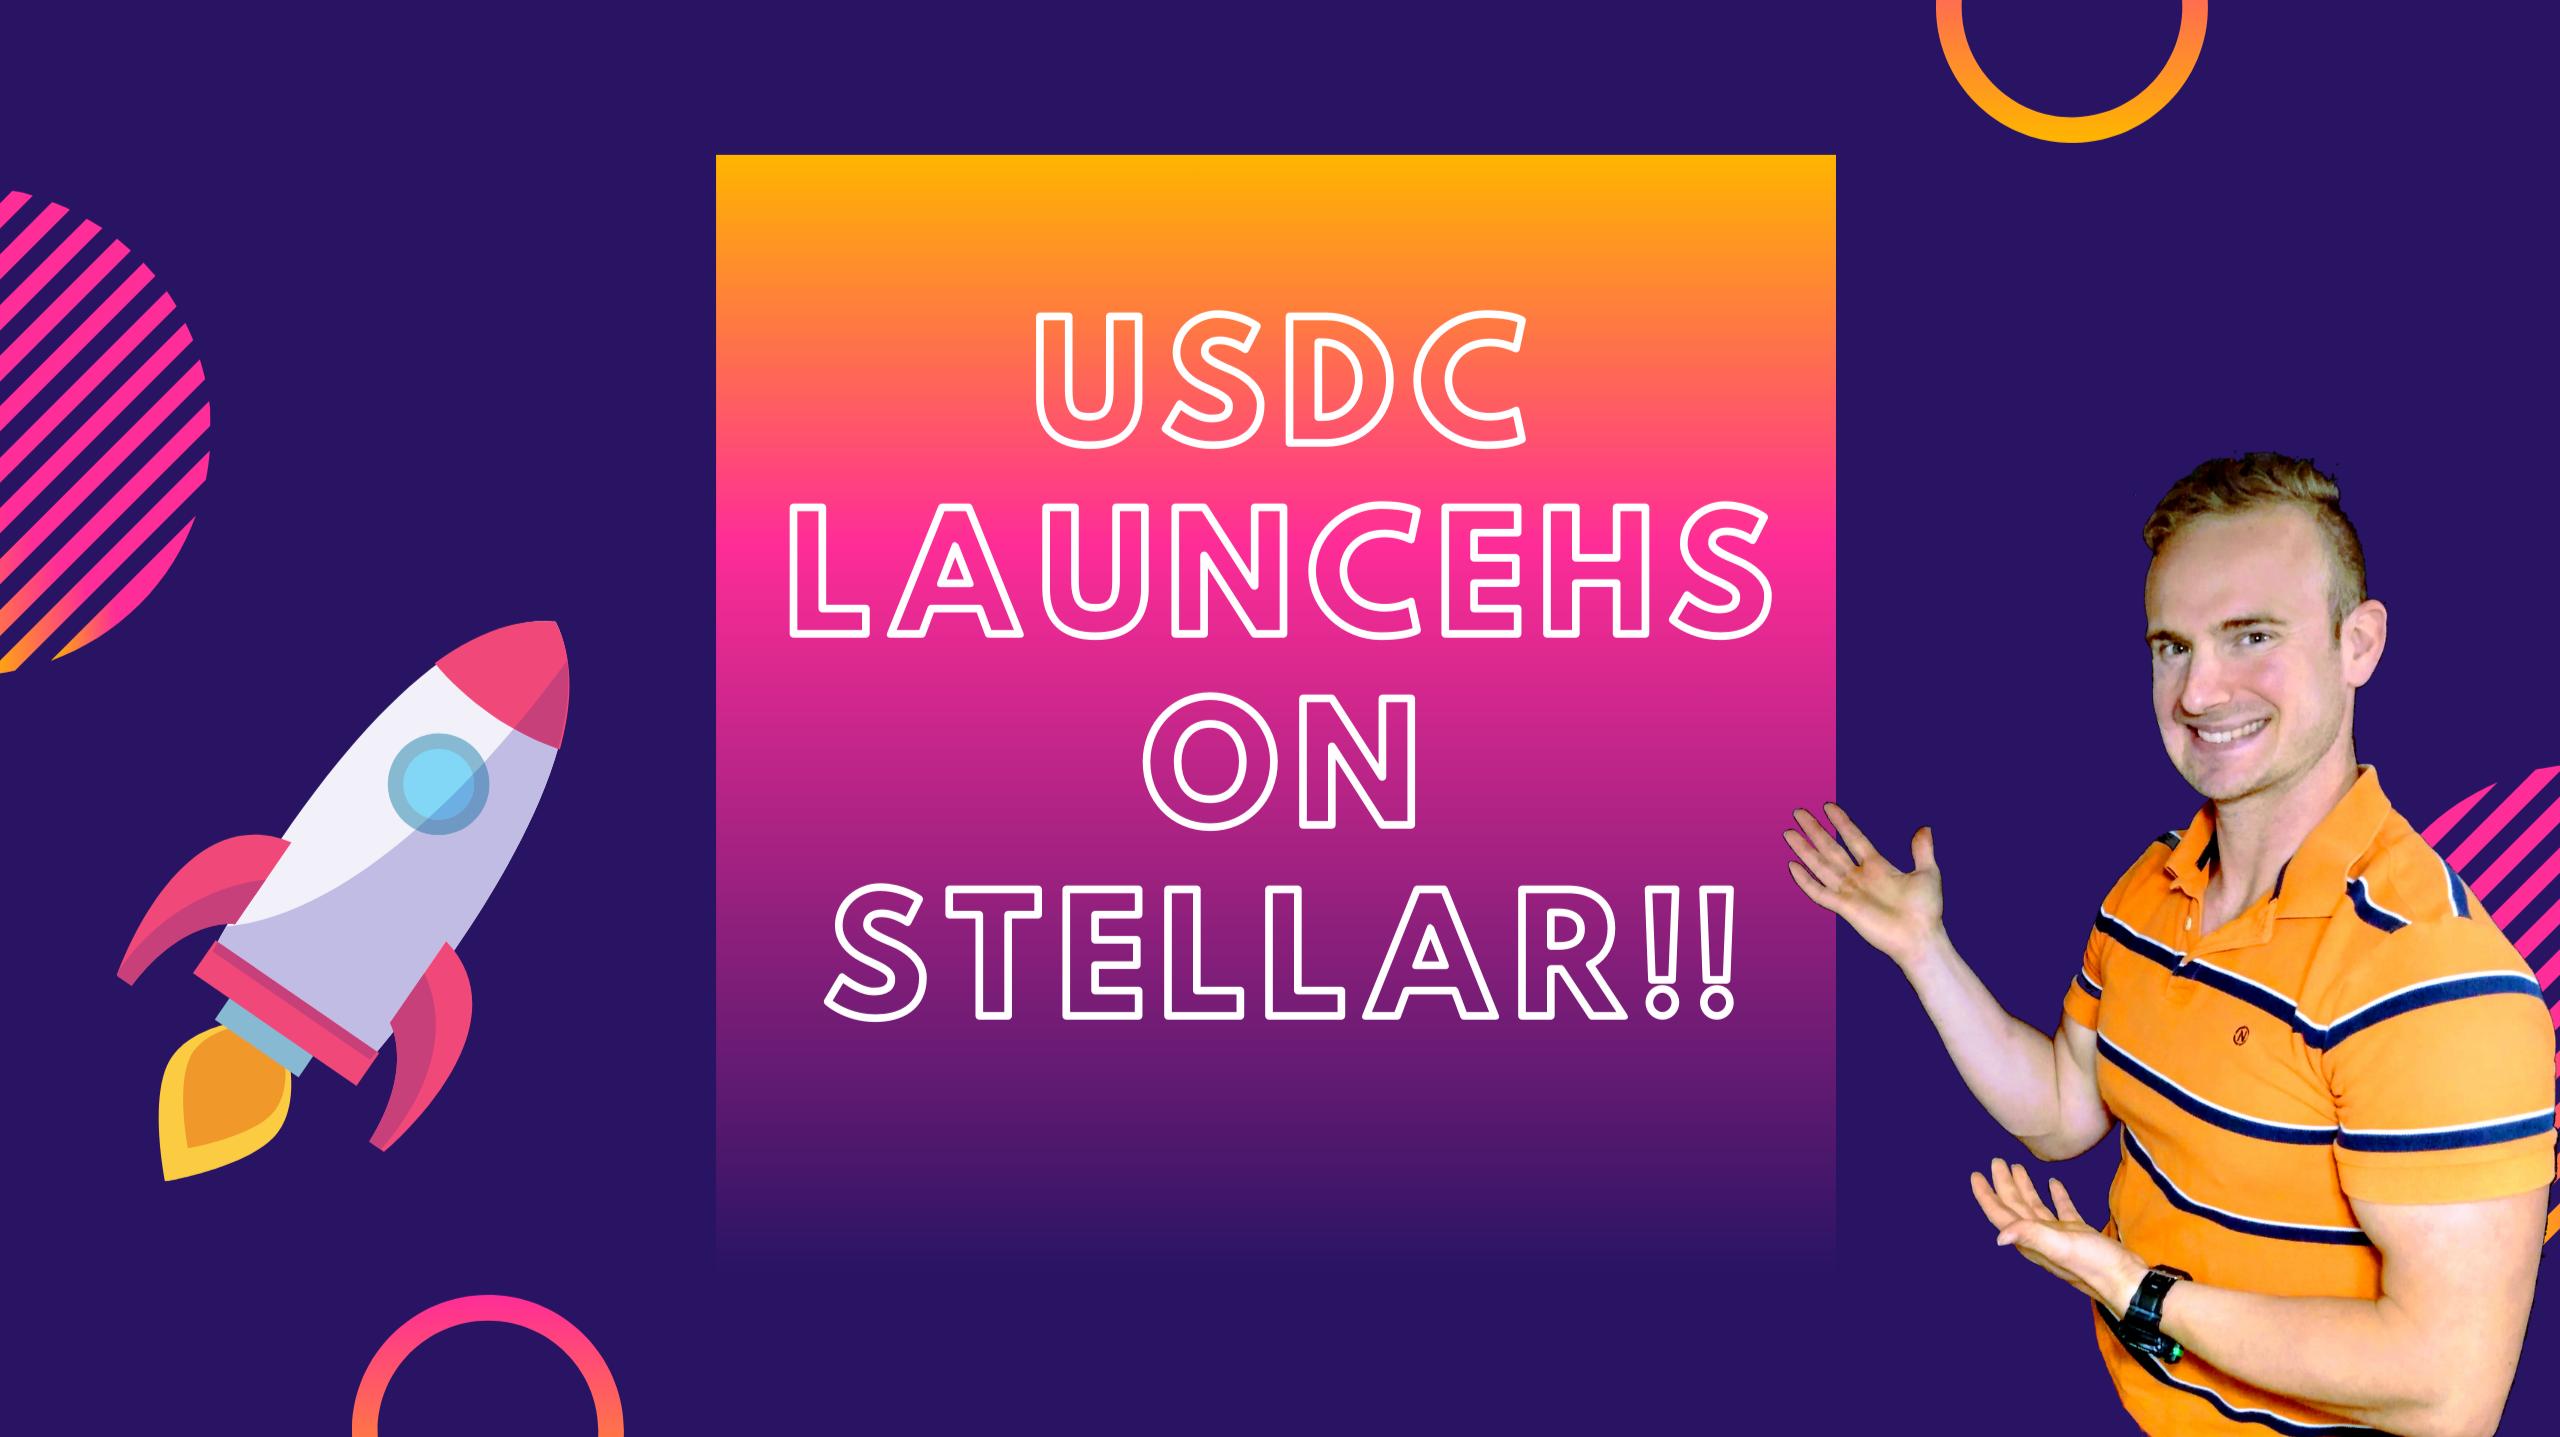 usdc launches on stellar